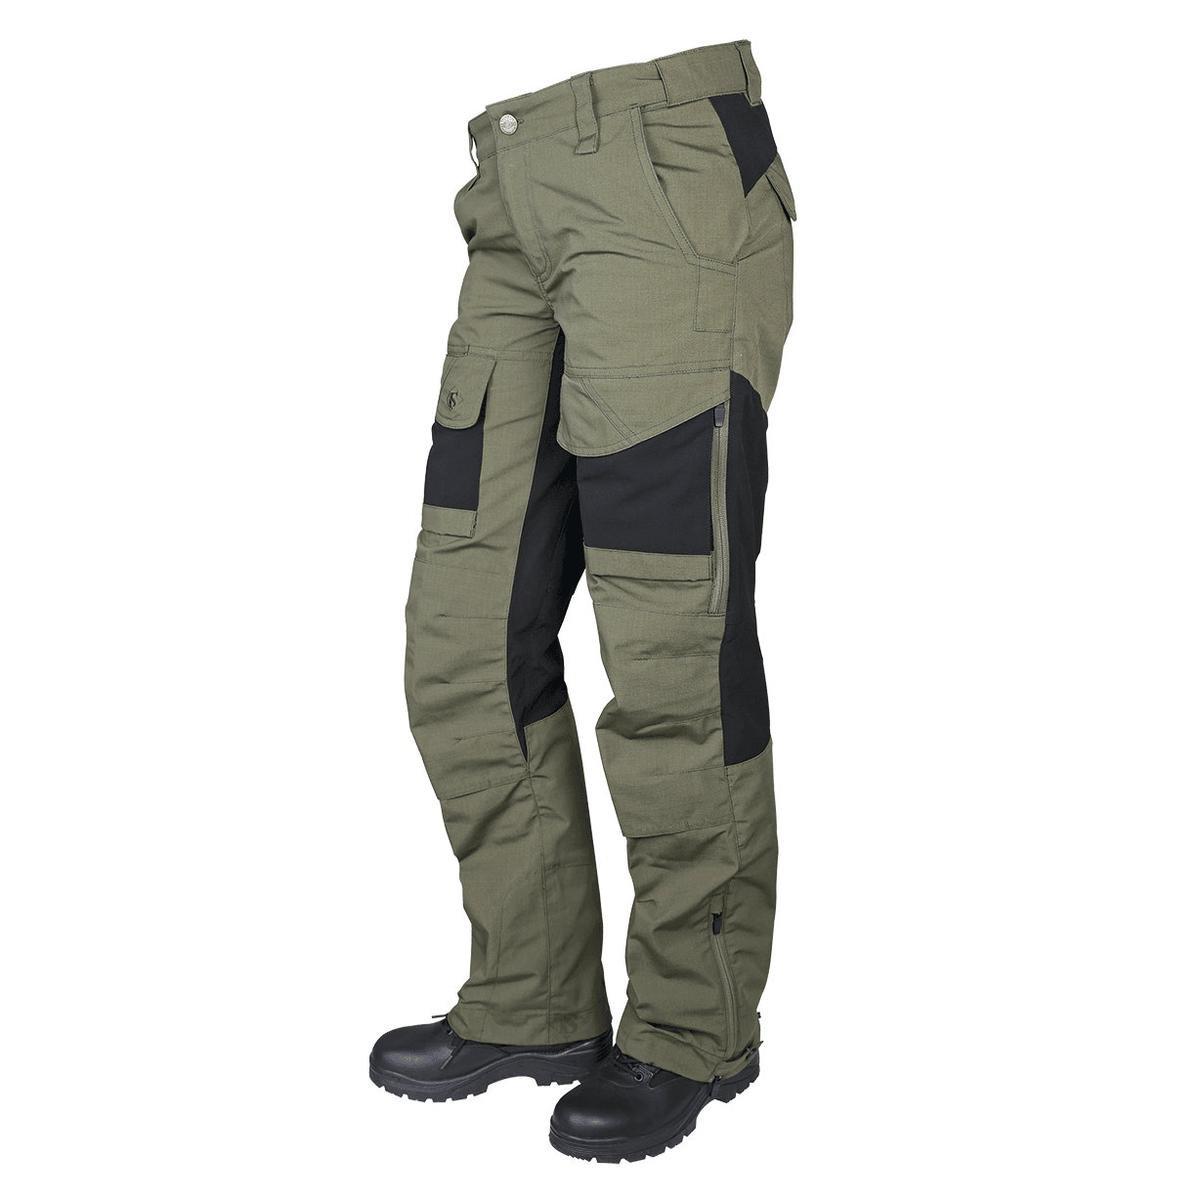 a0fdd31e34dc8 Amazon.com   Tru-Spec Women s Pants